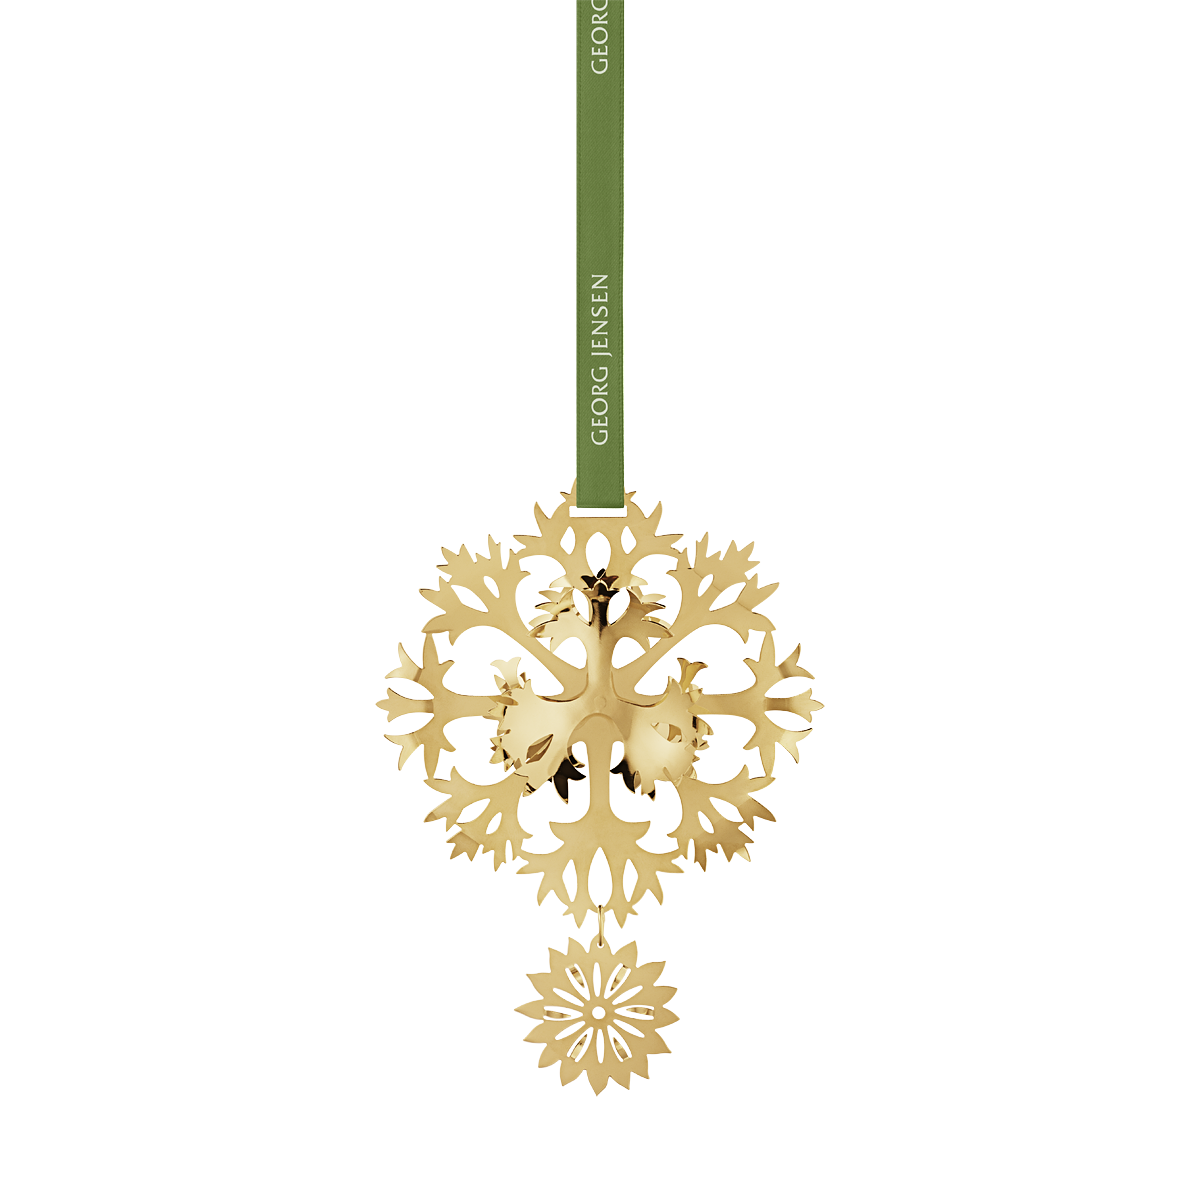 2020 Georg Jensen Christmas Mobile 2020 Christmas Mobile, Ice Flower   gold plated